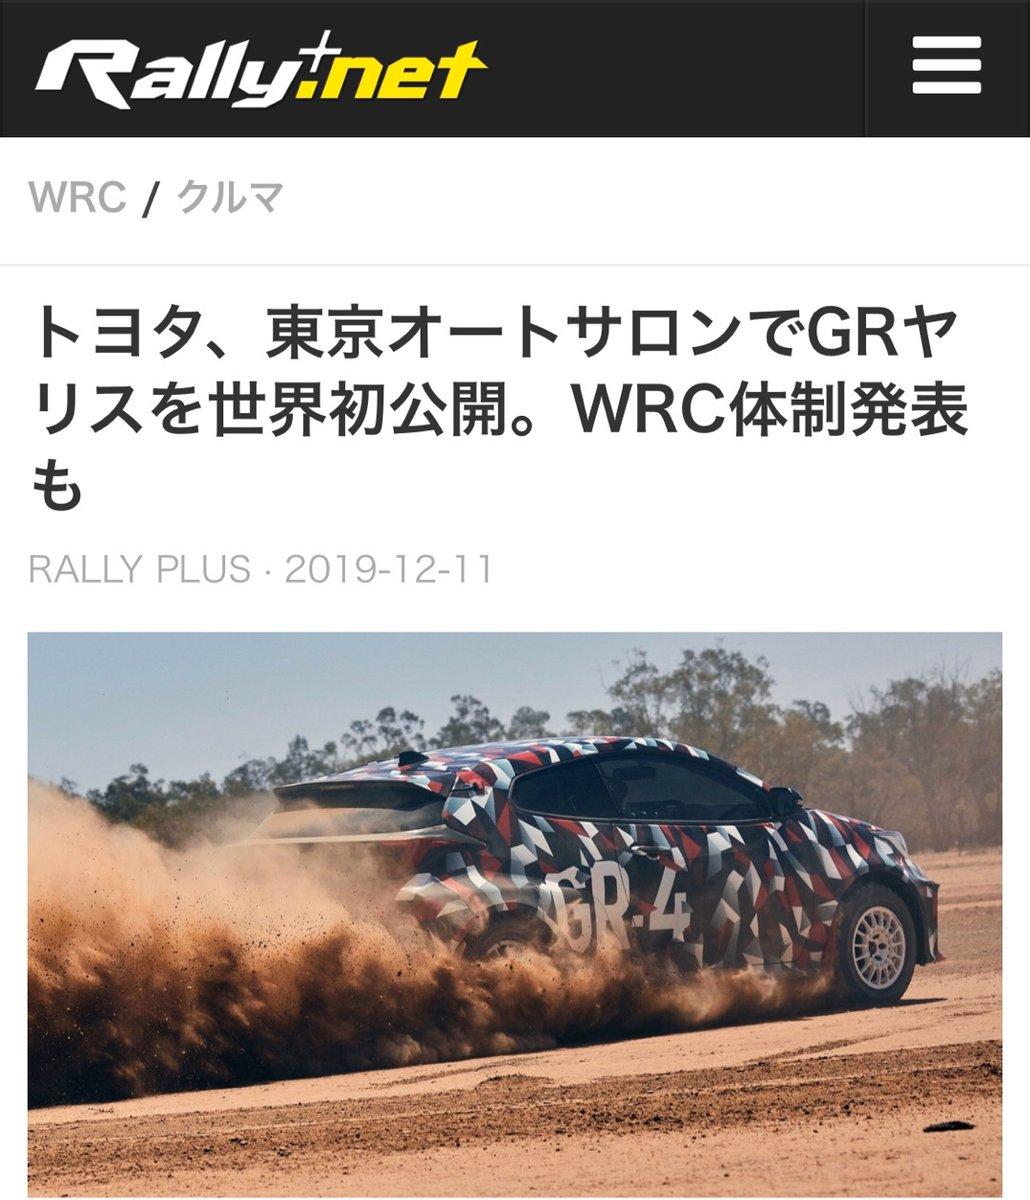 GRヤリス 東京オートサロンで世界初公開‼️ ー アメブロを更新しました#脇阪寿一#GRヤリス